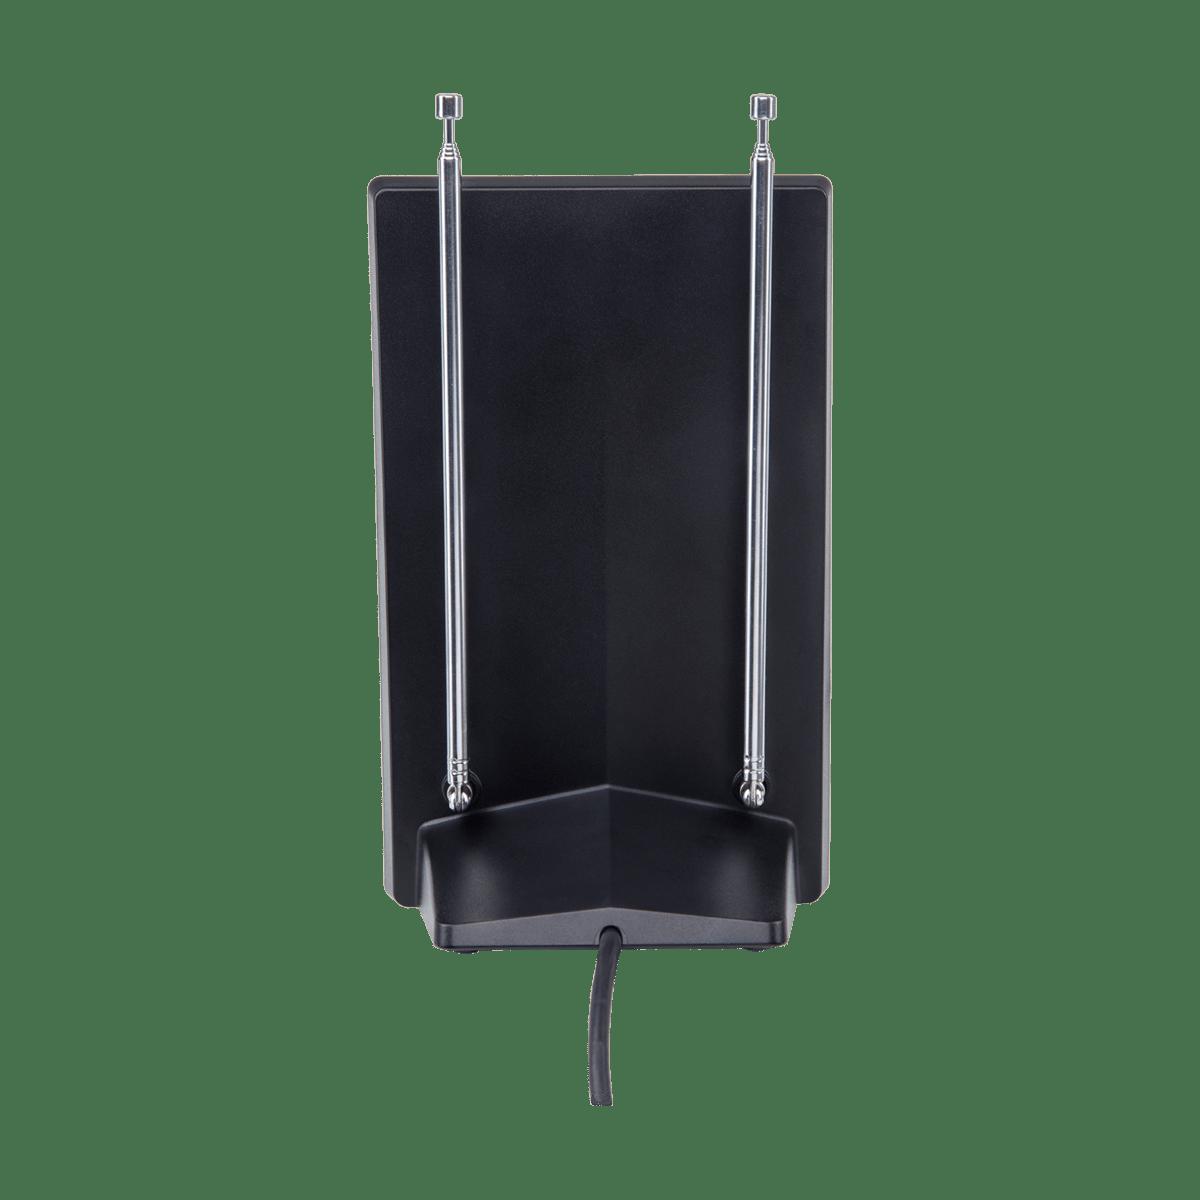 Antena de TV Interna Intelbras UHF/VHF/HDTV AI 2021